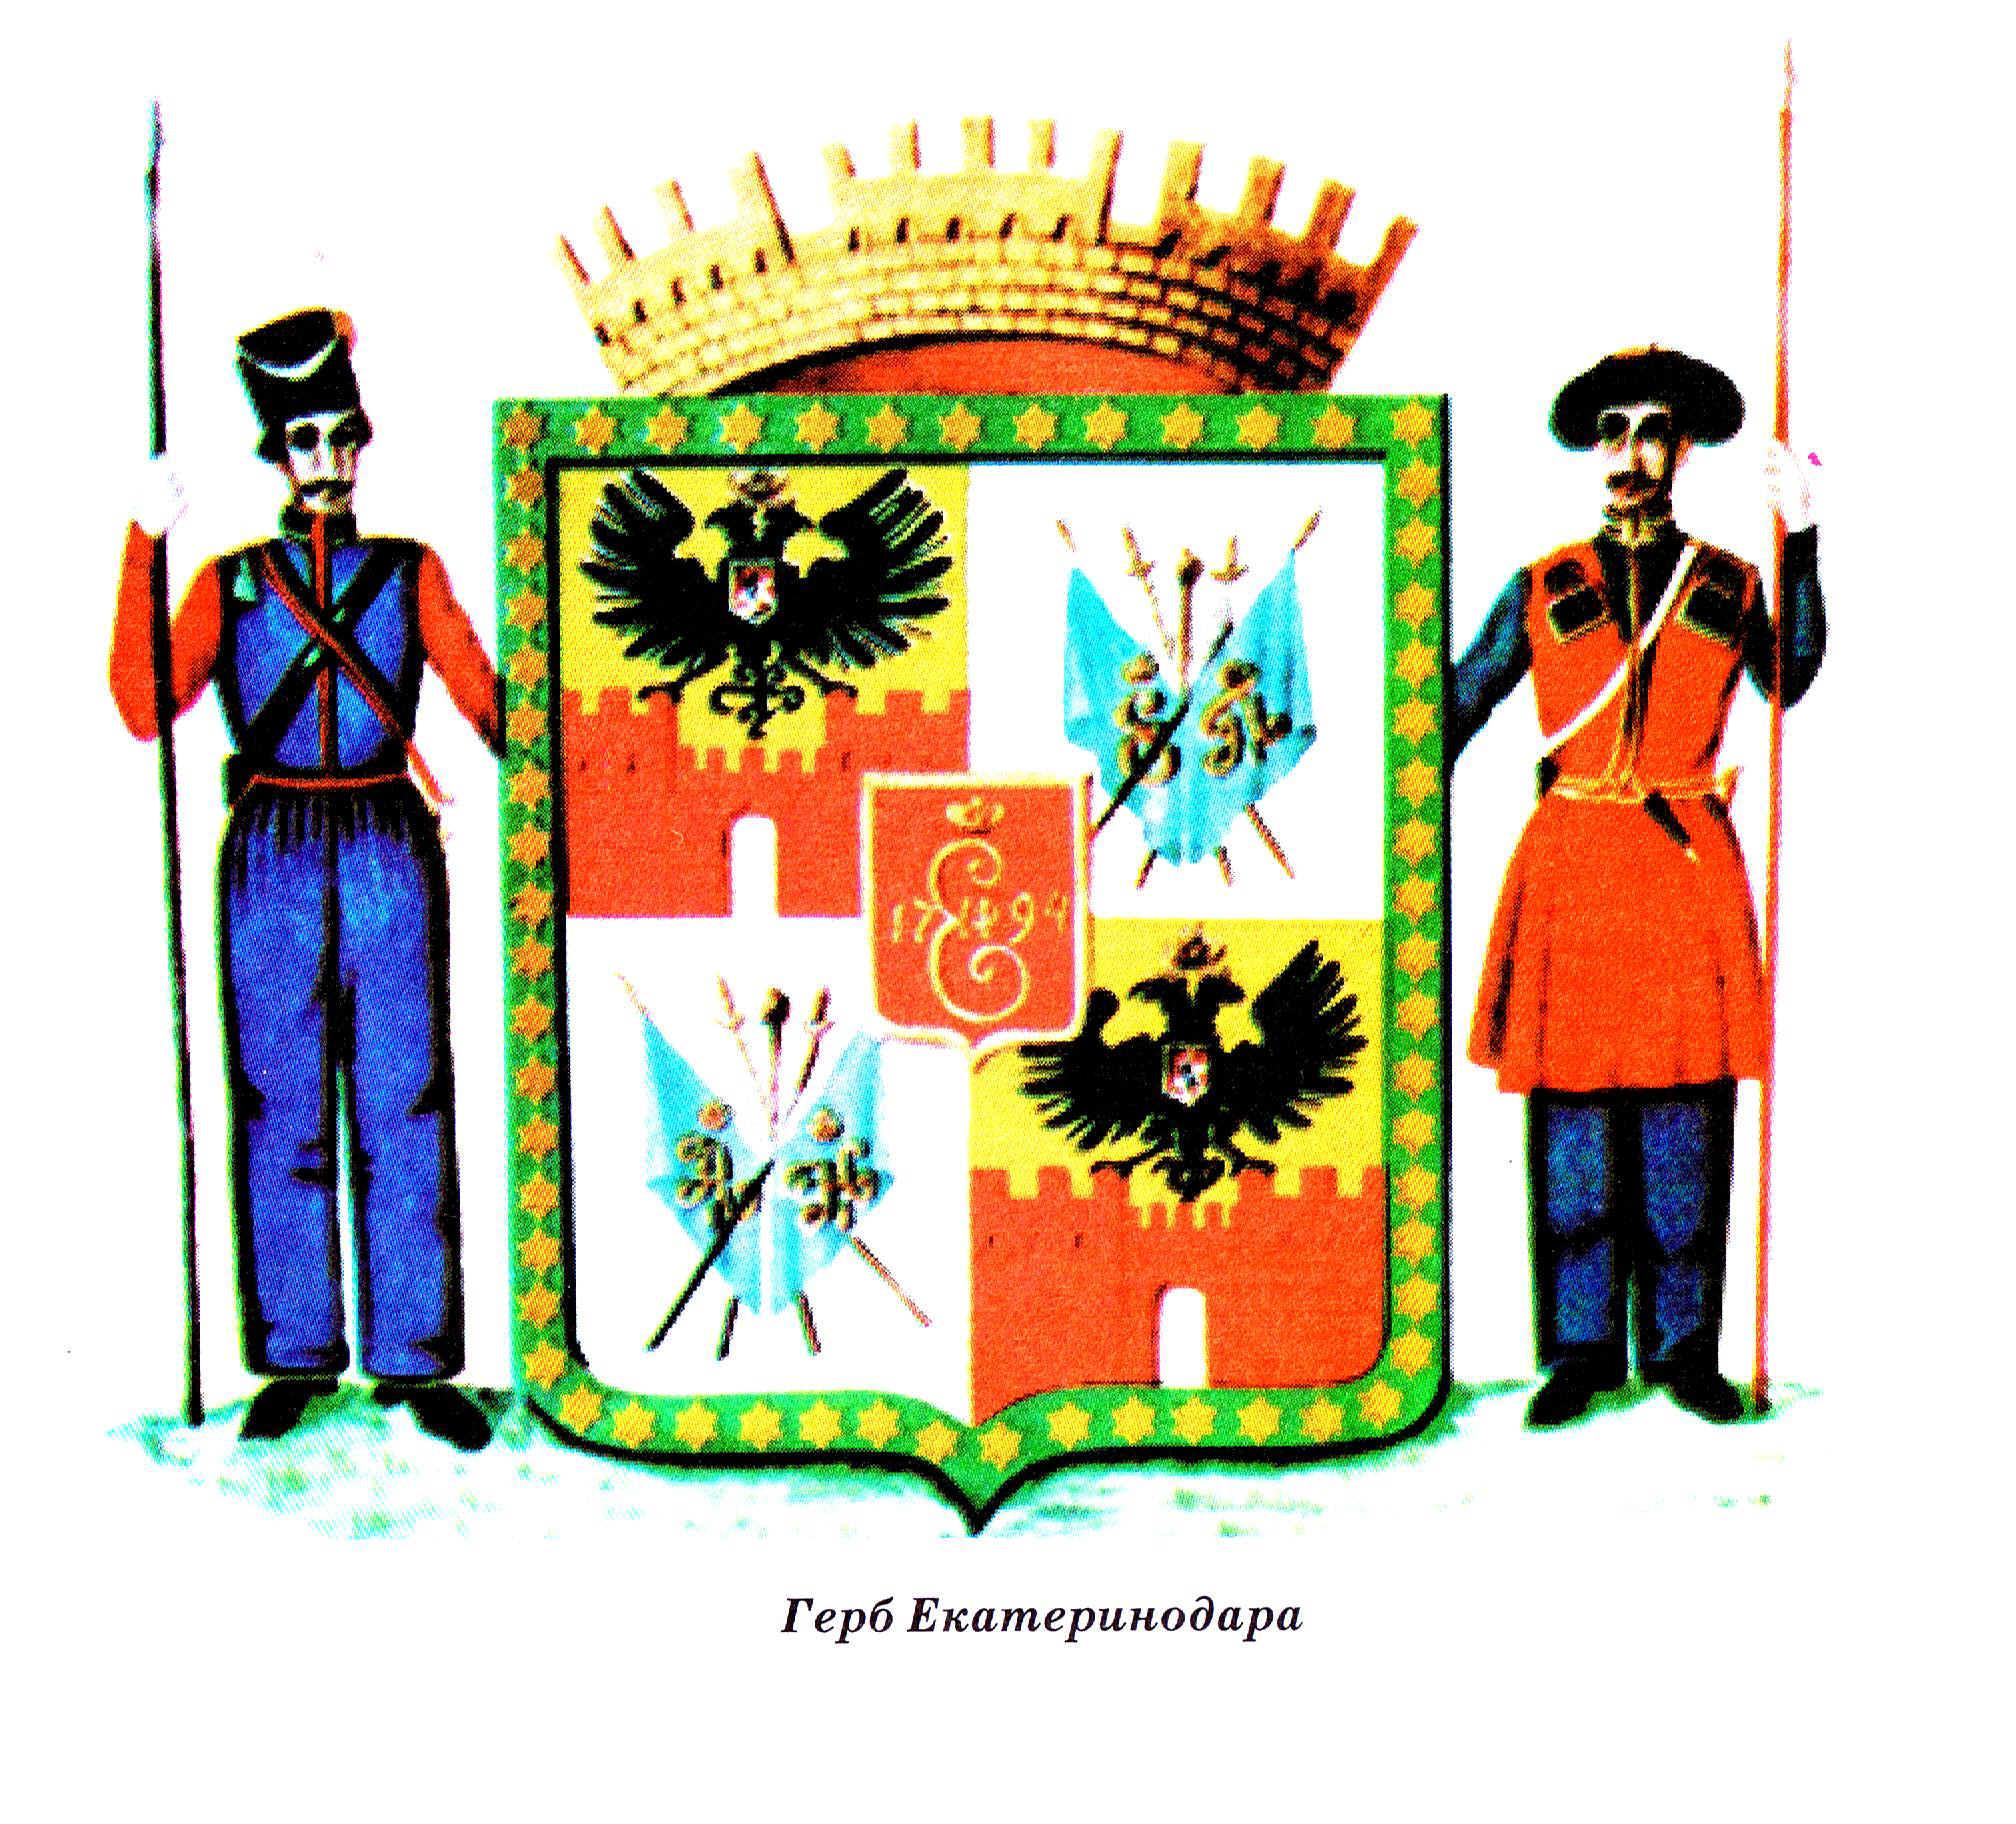 картинки герба города краснодар дизайн ногтей